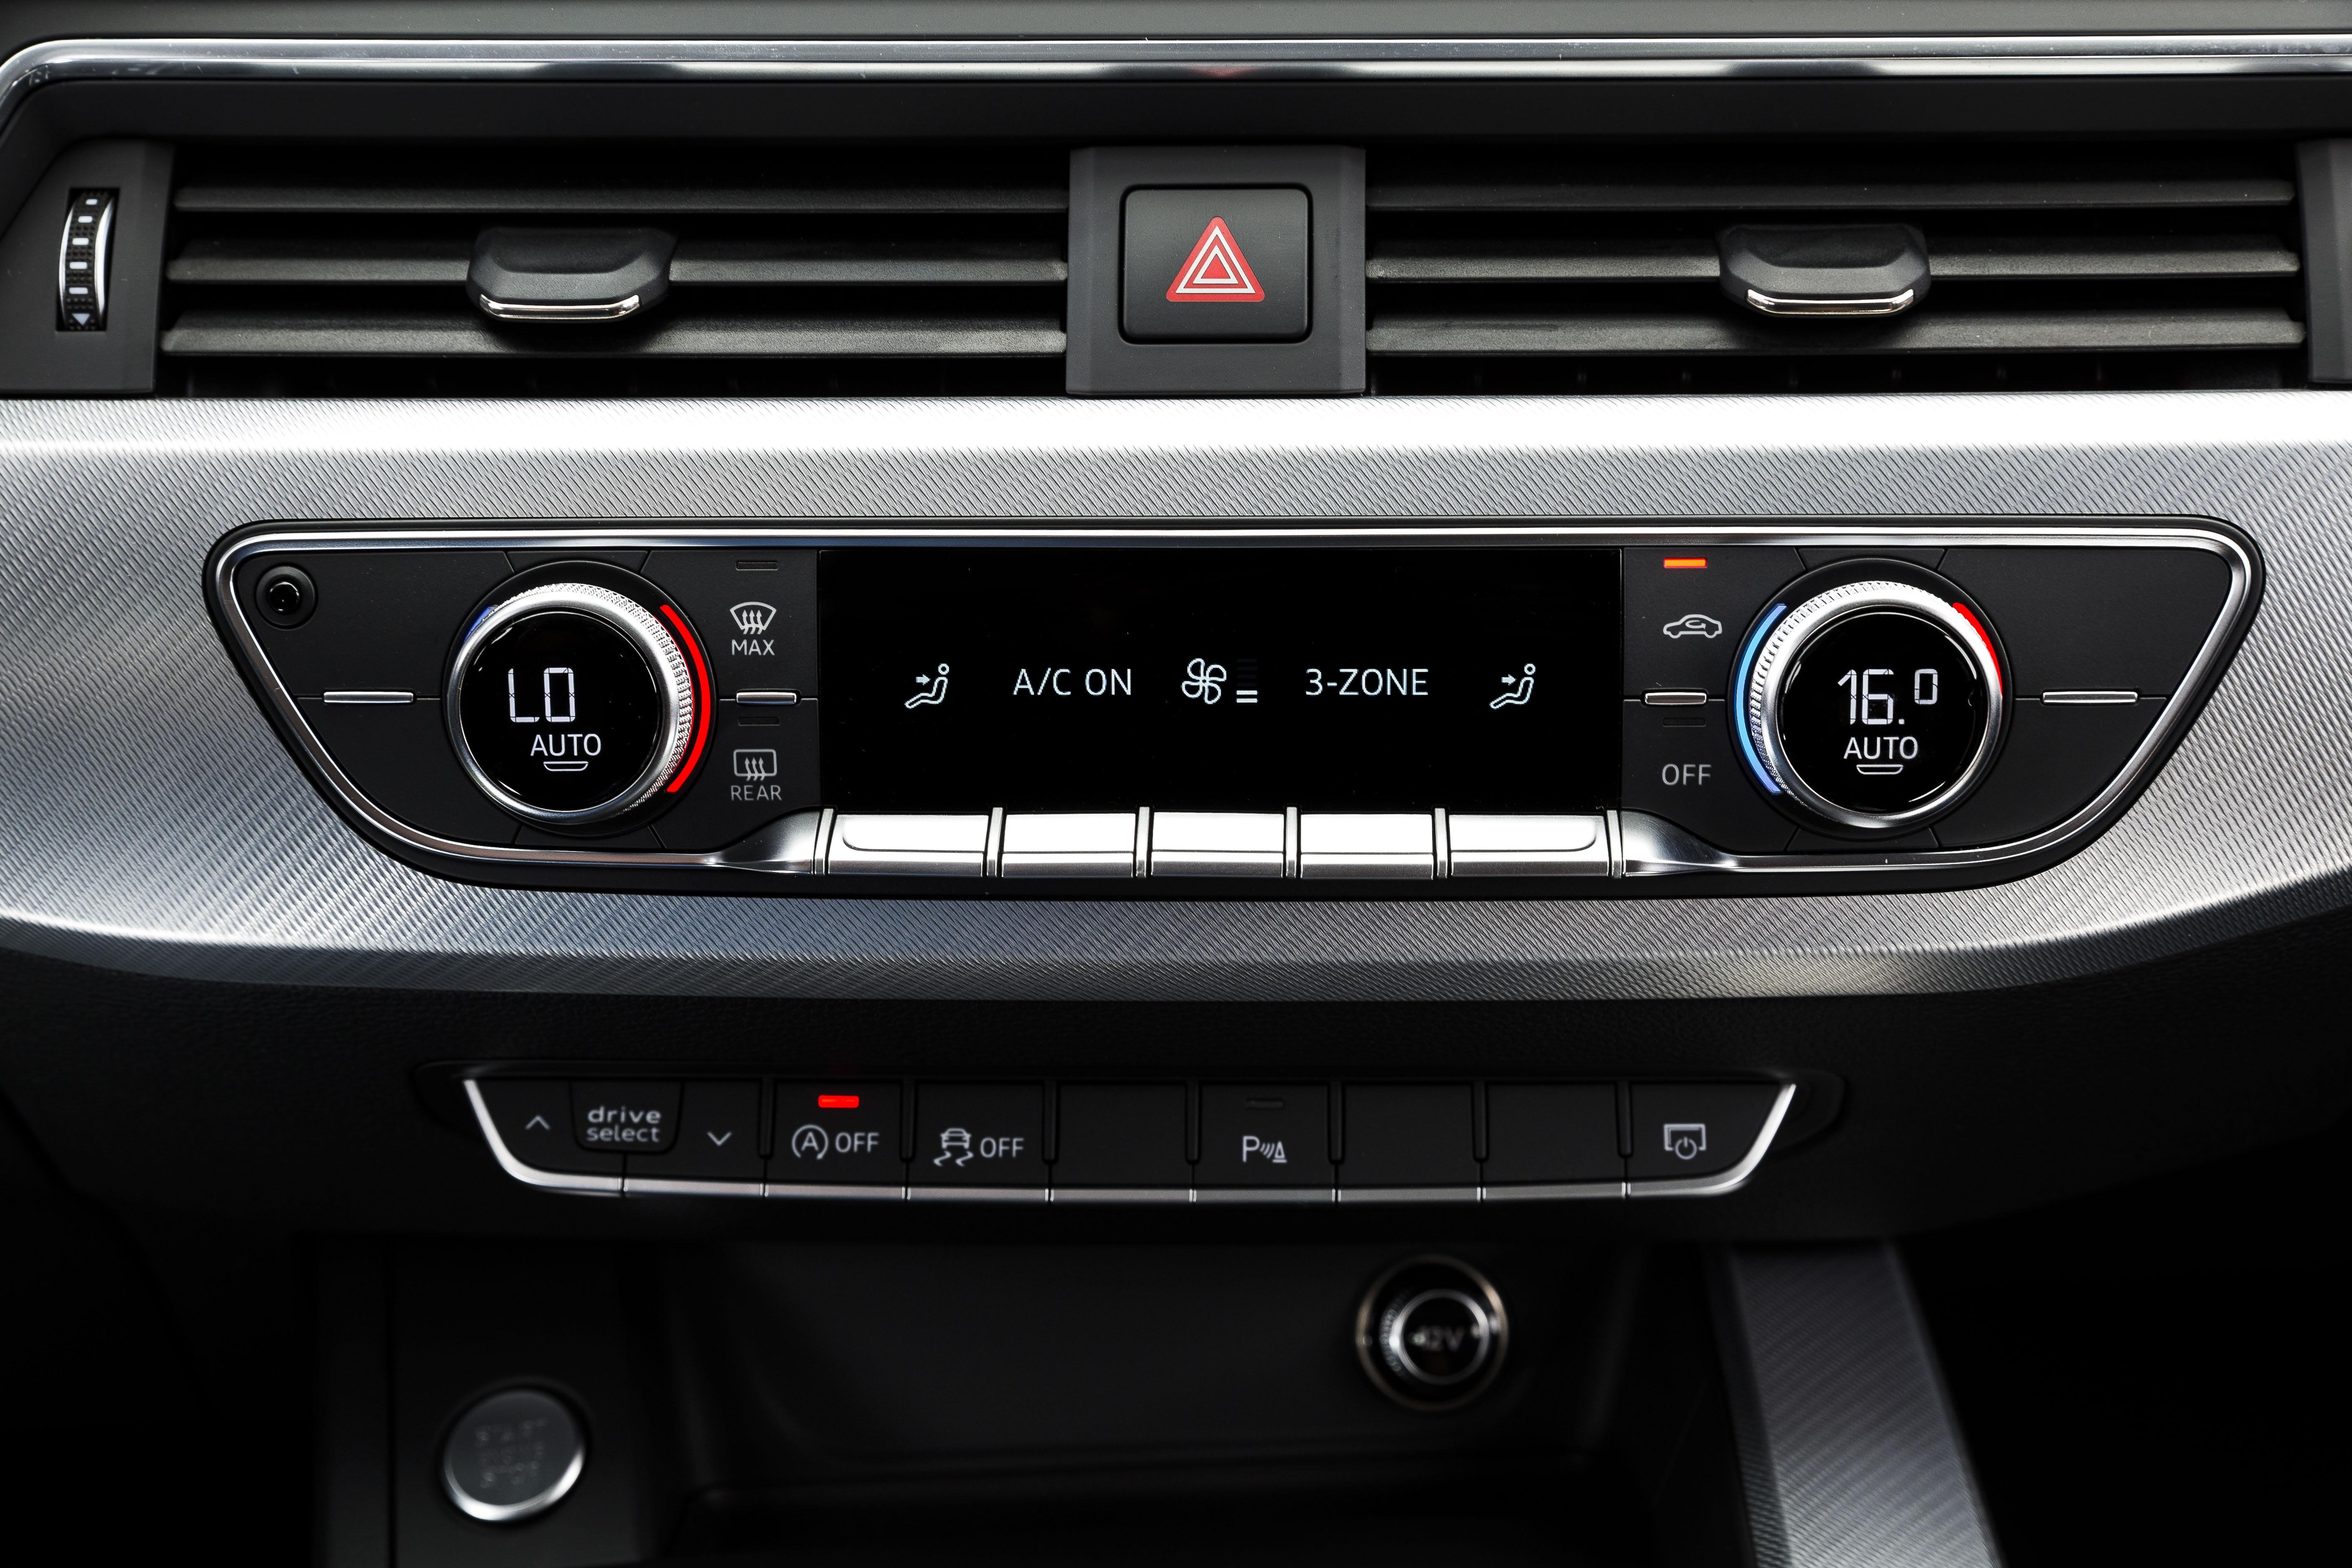 Audi A4 2553 0